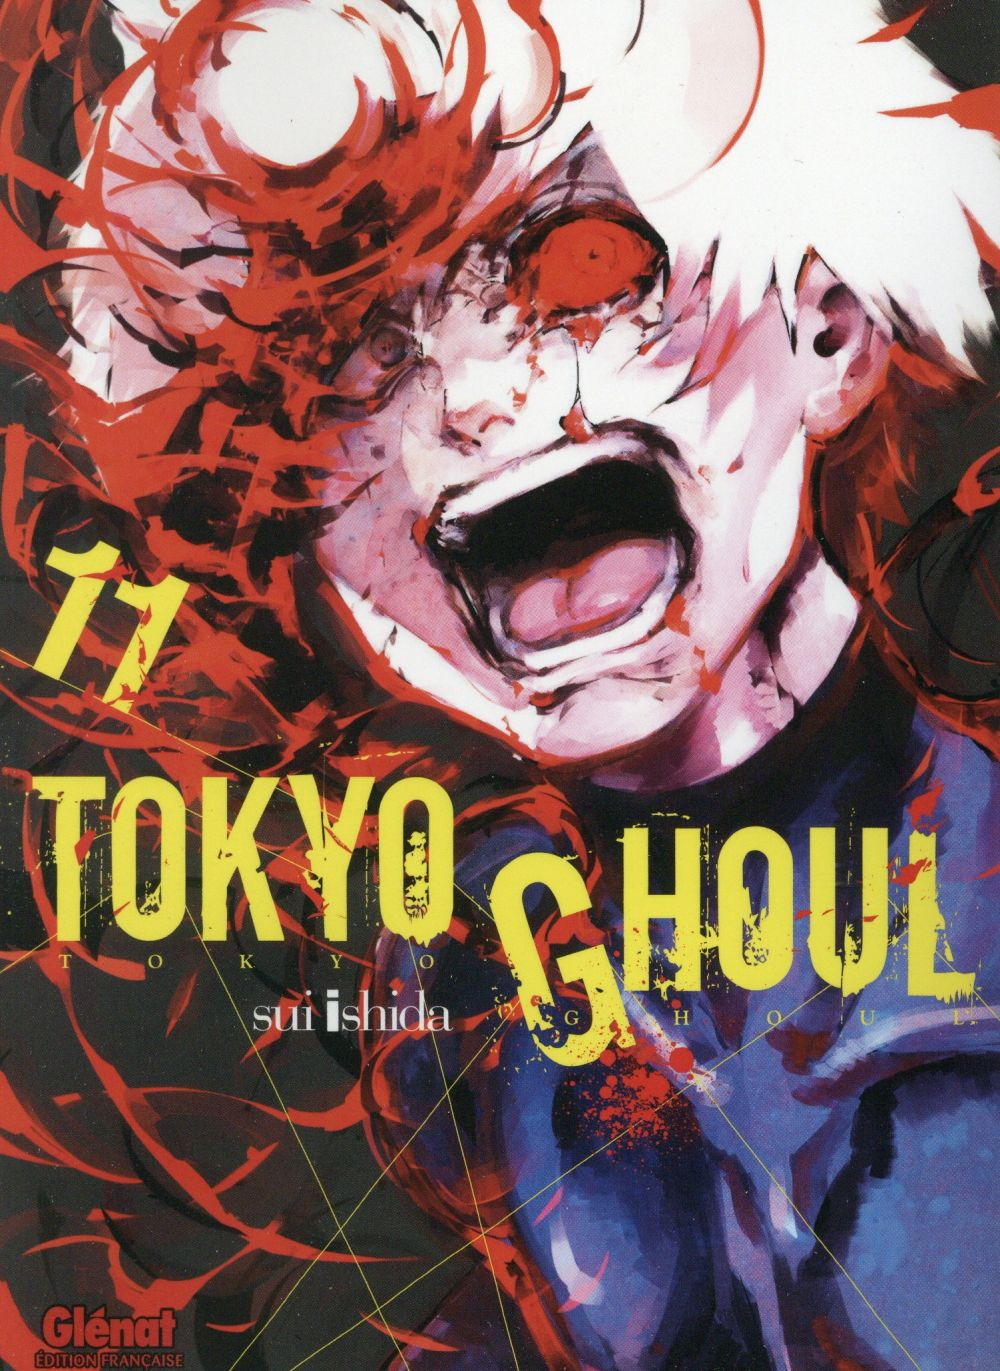 TOKYO GHOUL - TOME 11 Ishida Sui Glénat